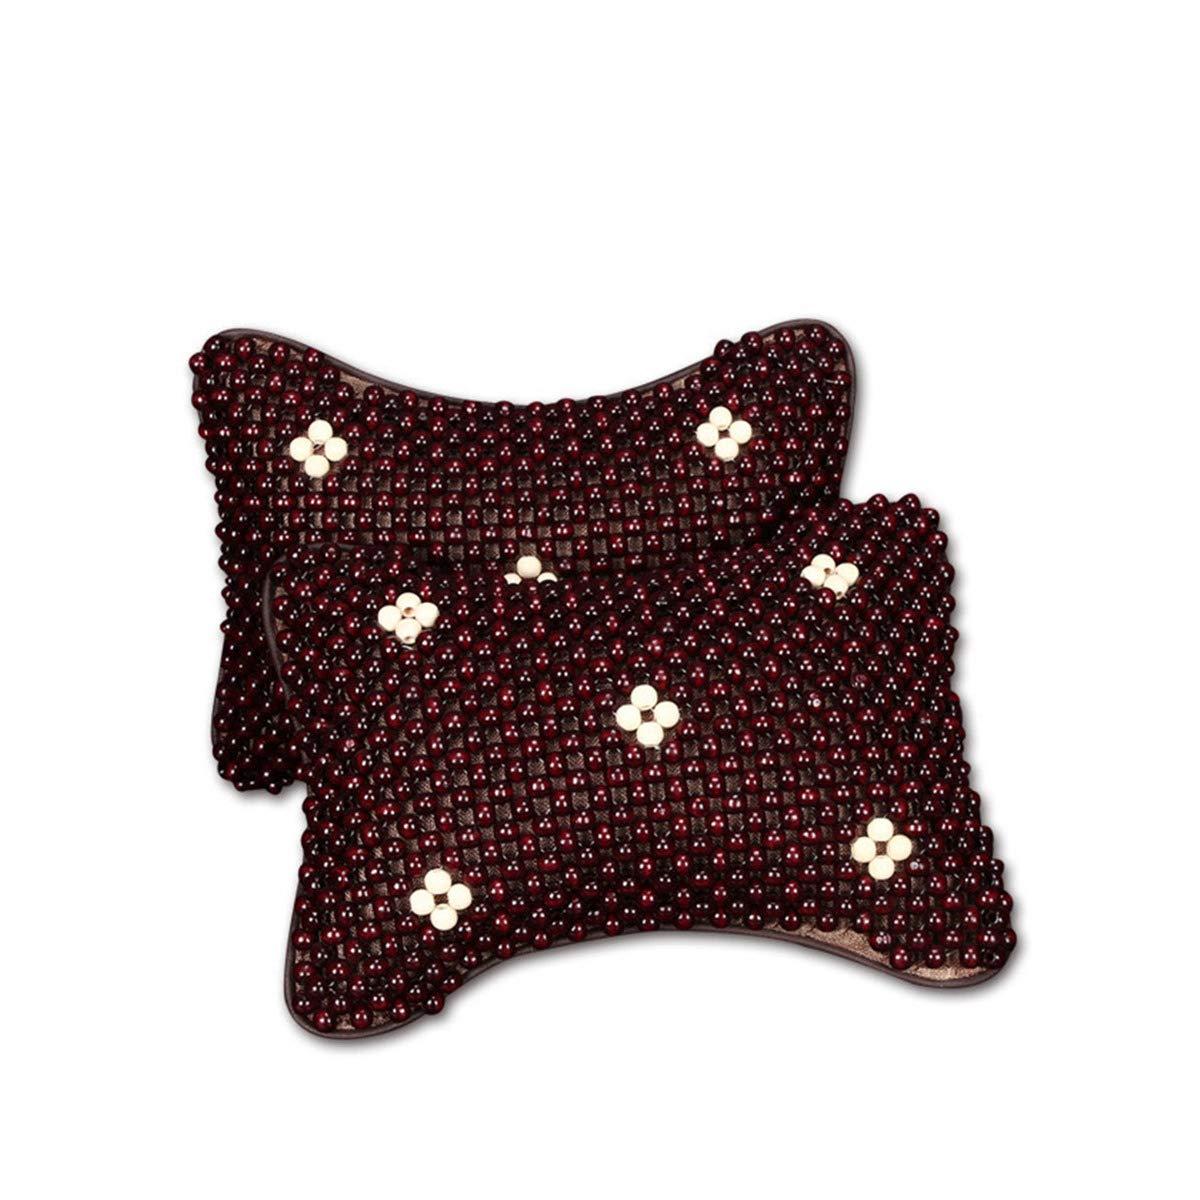 ECYC 2Pcs Car Neck Pillow Wood Bead Head Message Headrest Breathe Pillow Pad, Winred